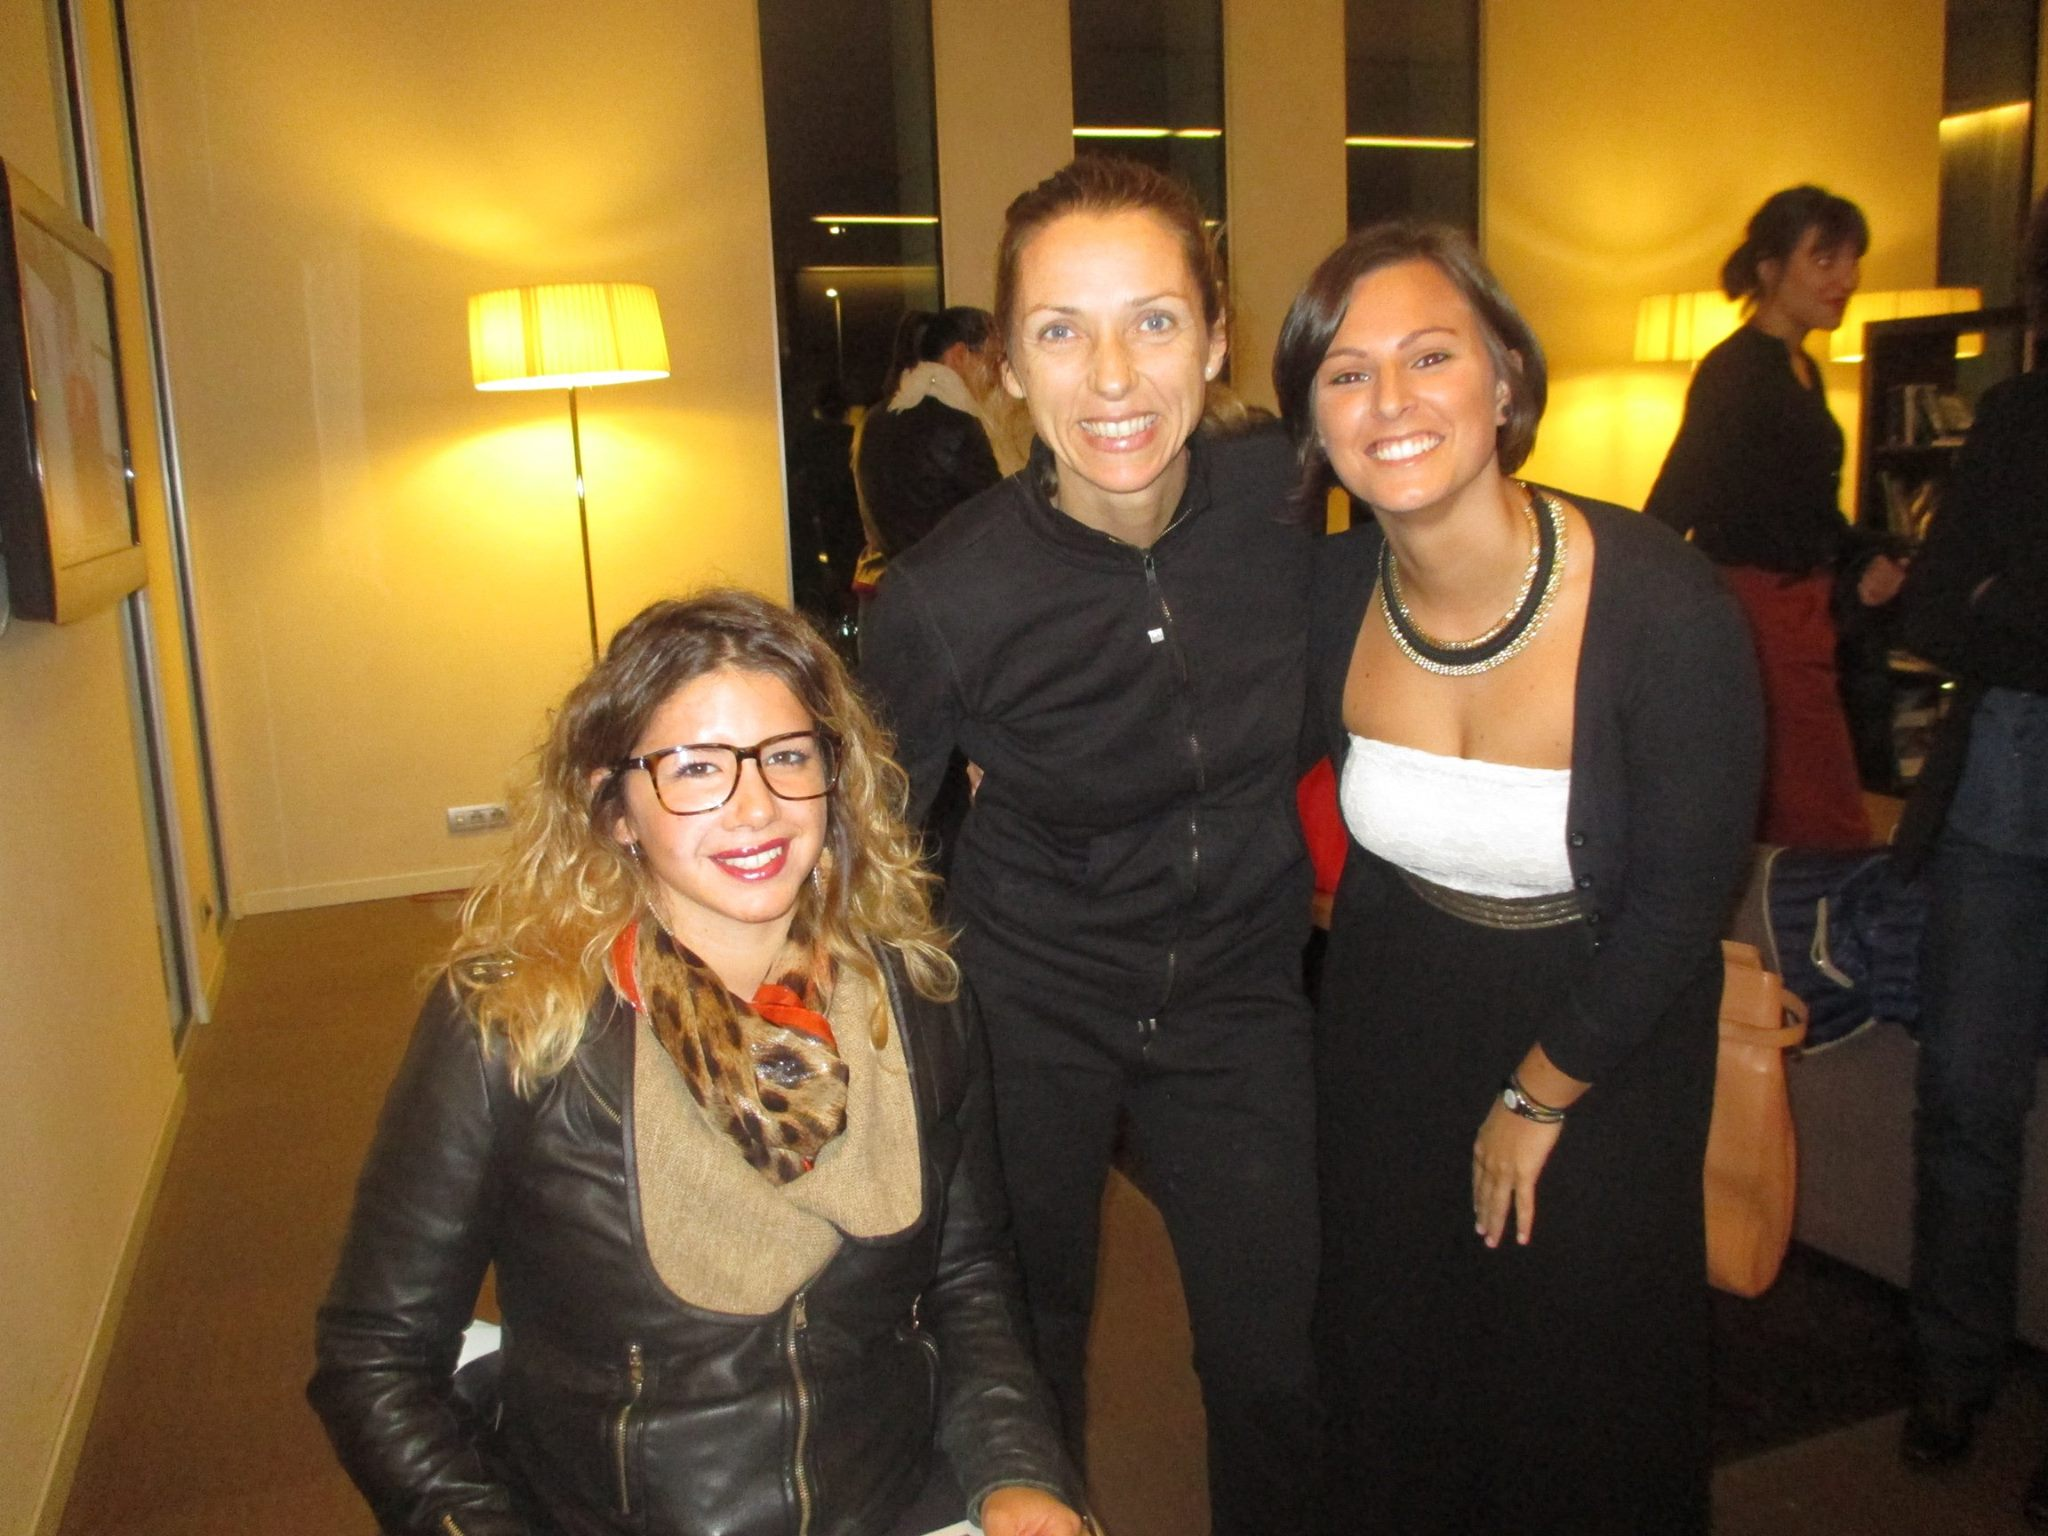 Giulia De Maio, Marina Romoli, Valentina Vezzali